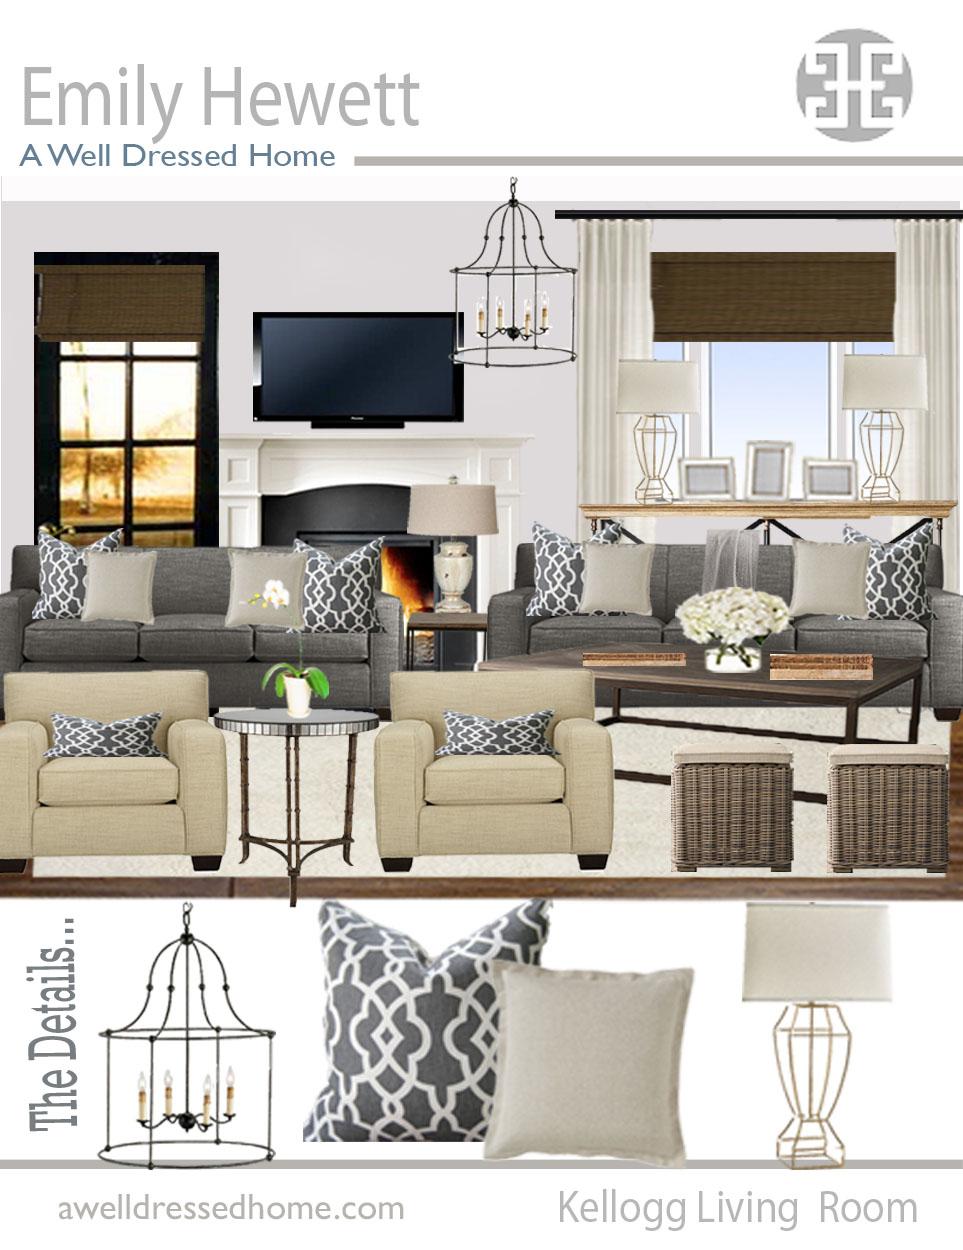 Online Design Board Promo!